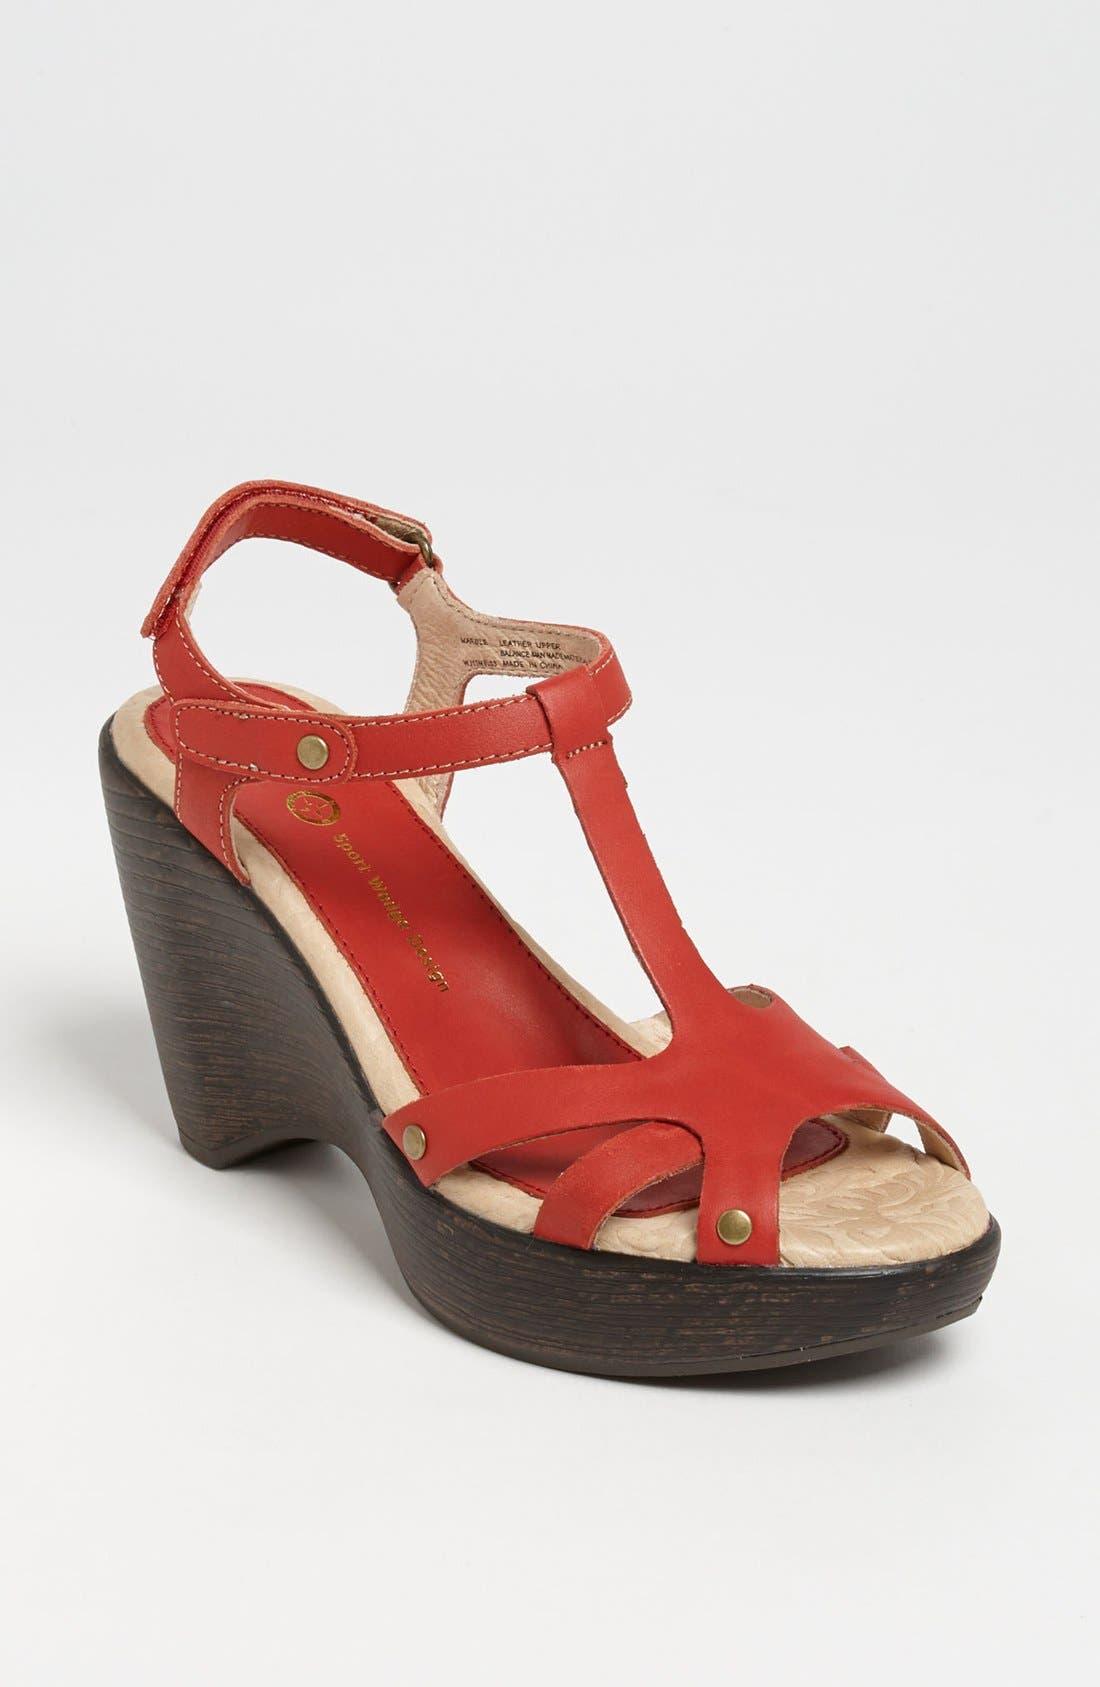 Alternate Image 1 Selected - Jambu 'Marble' Sandal